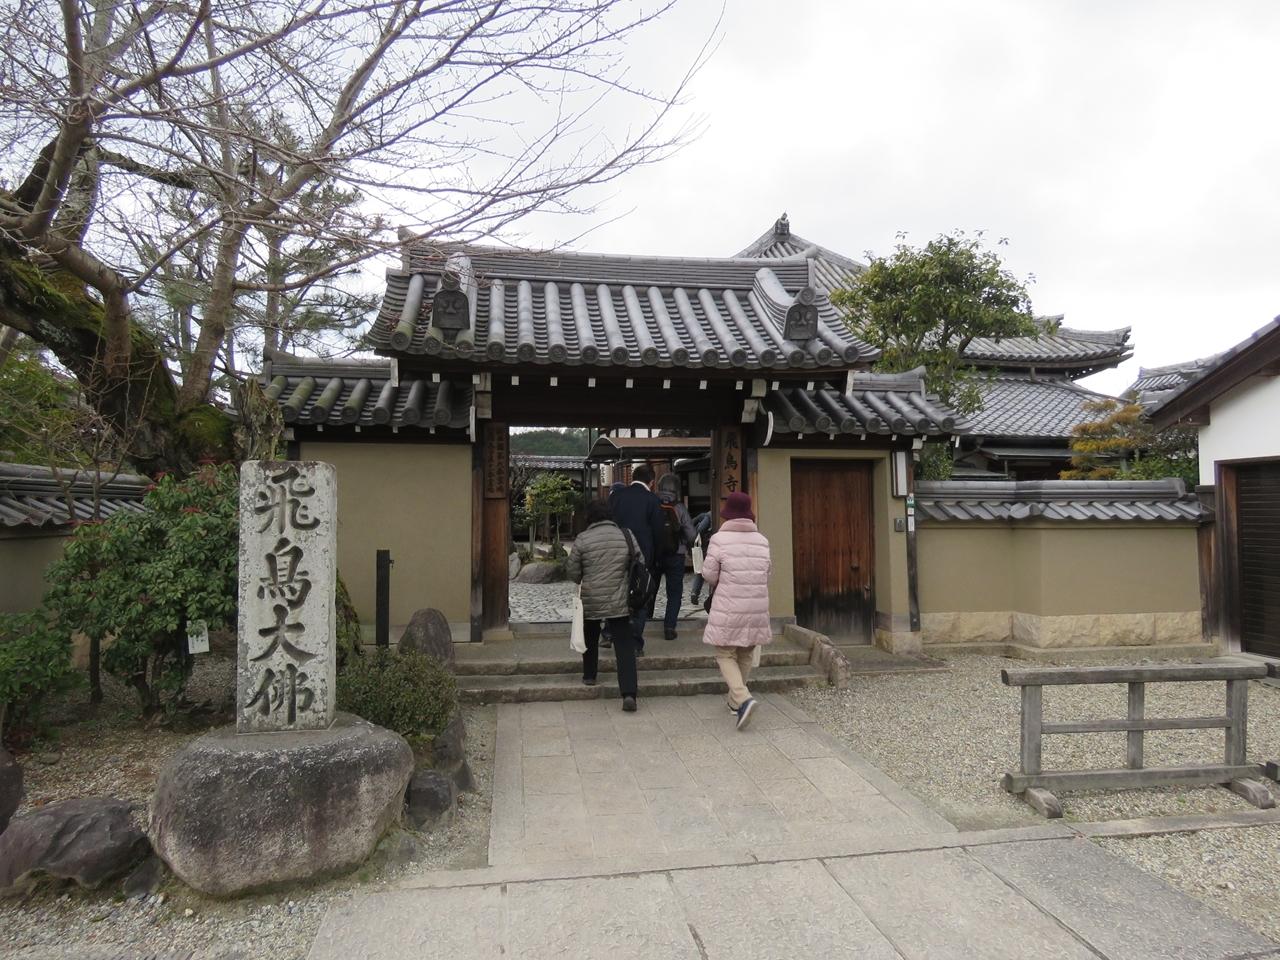 s-飛鳥寺 200210